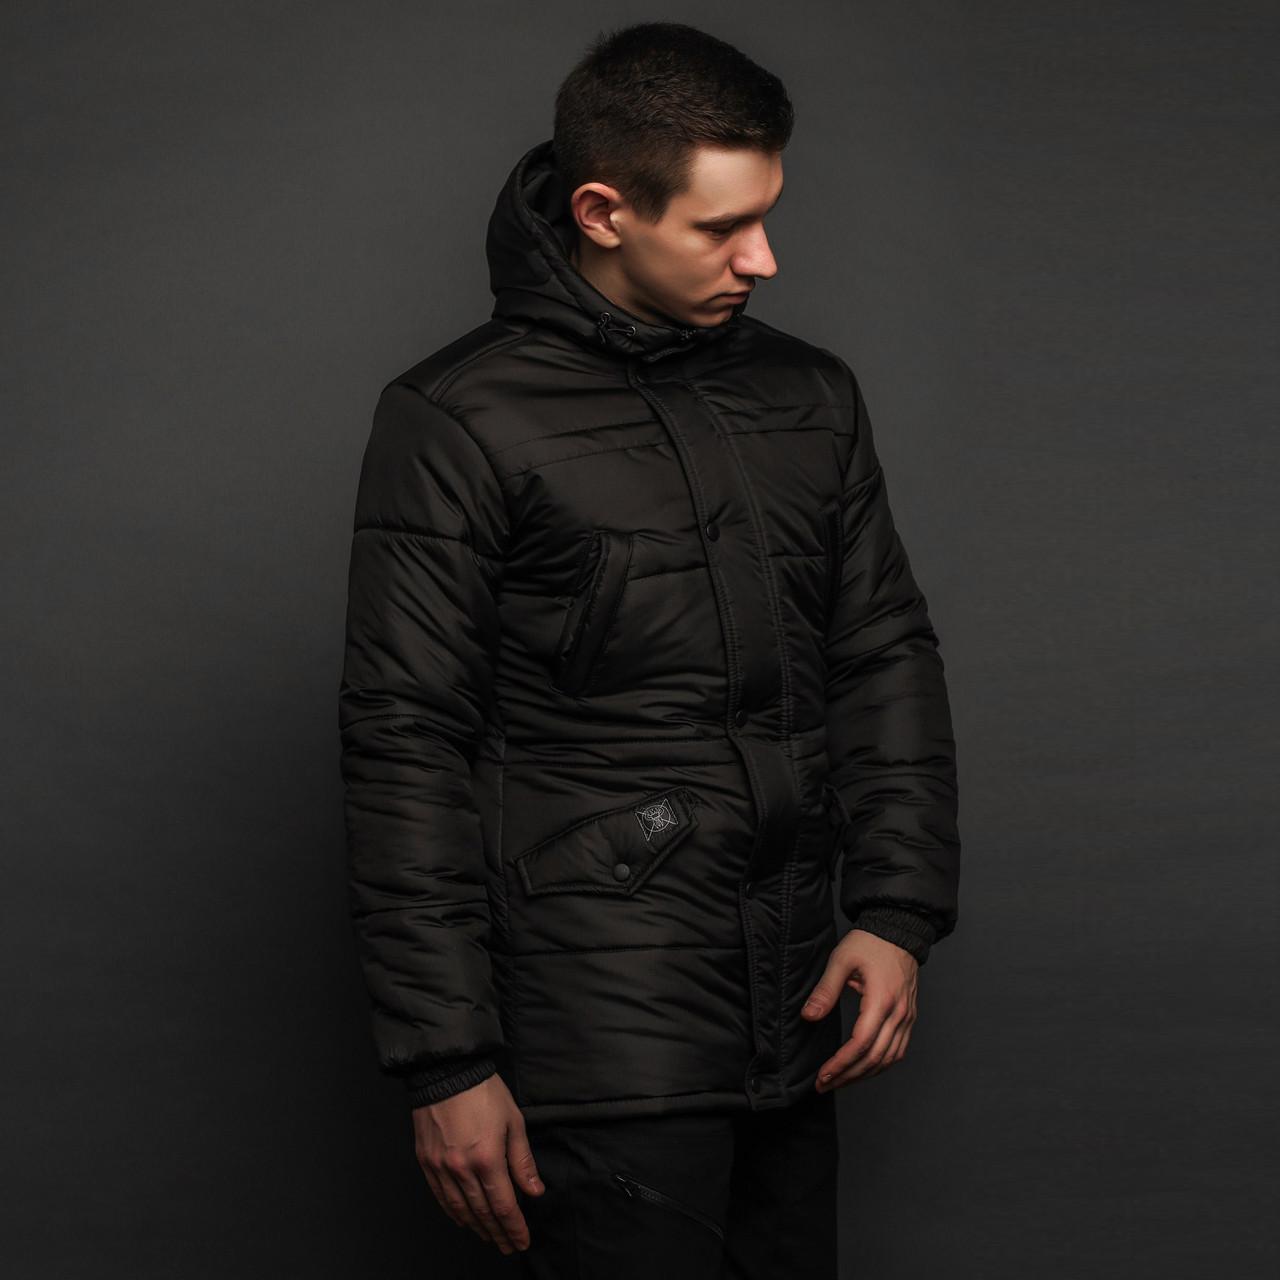 Зимняя куртка парка мужская черная бренд ТУР модель Бизон (Bizon) размер S, M, L, XL, XXL